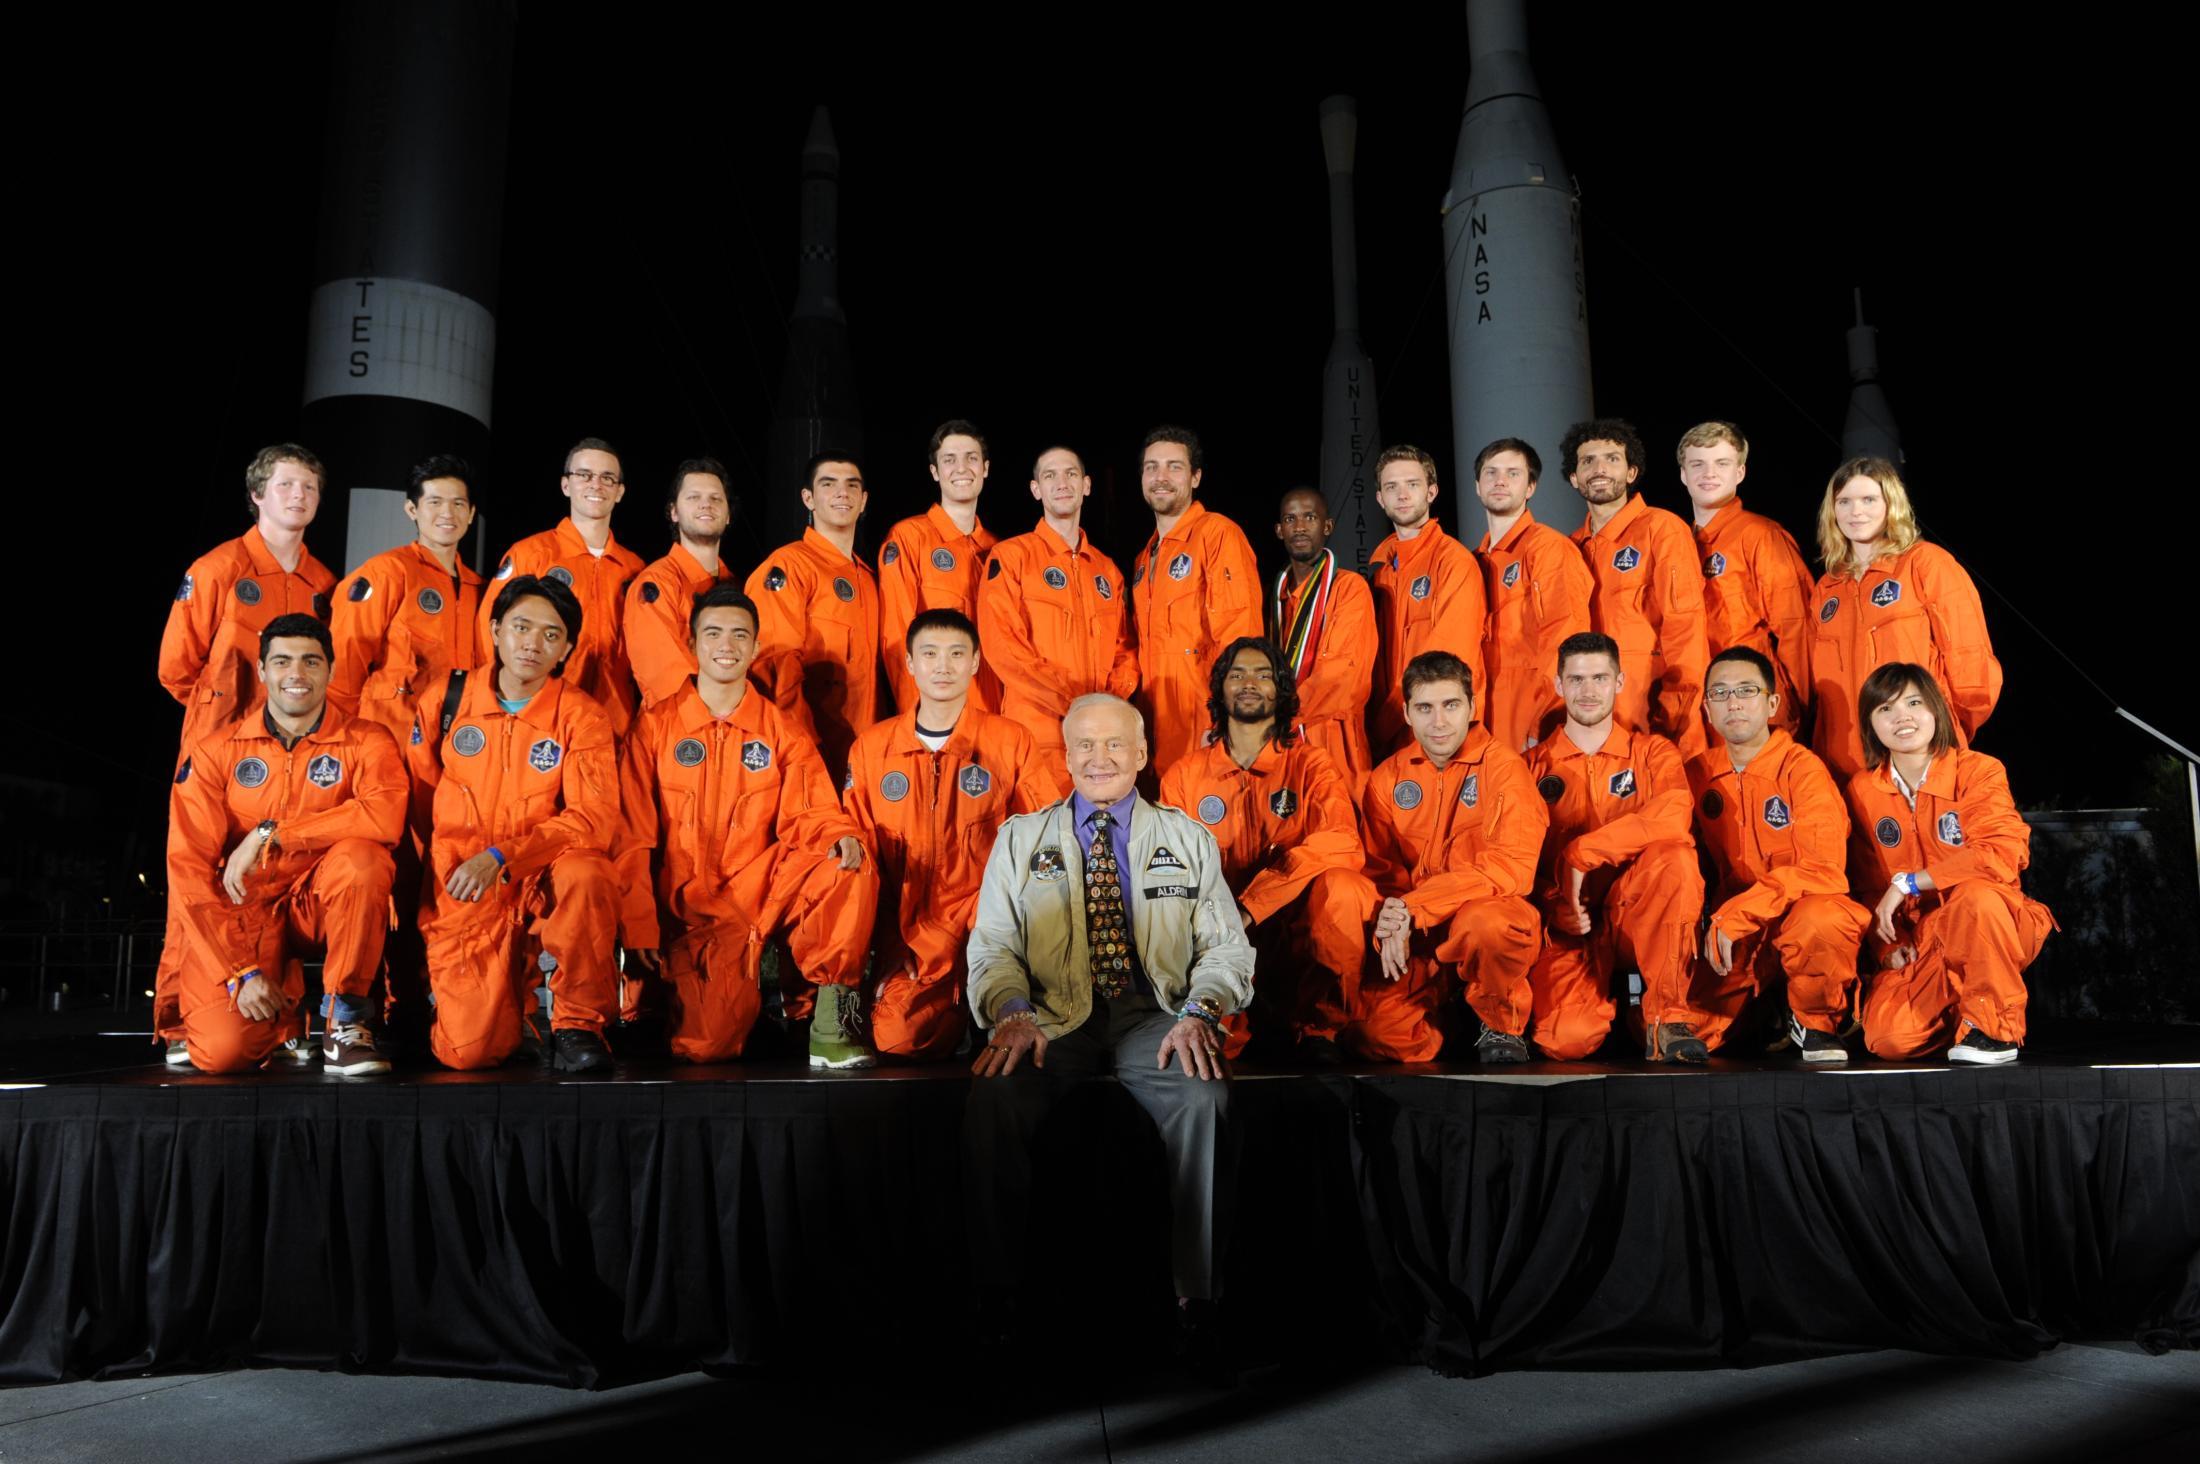 Thumbnail for Generation Astronaut